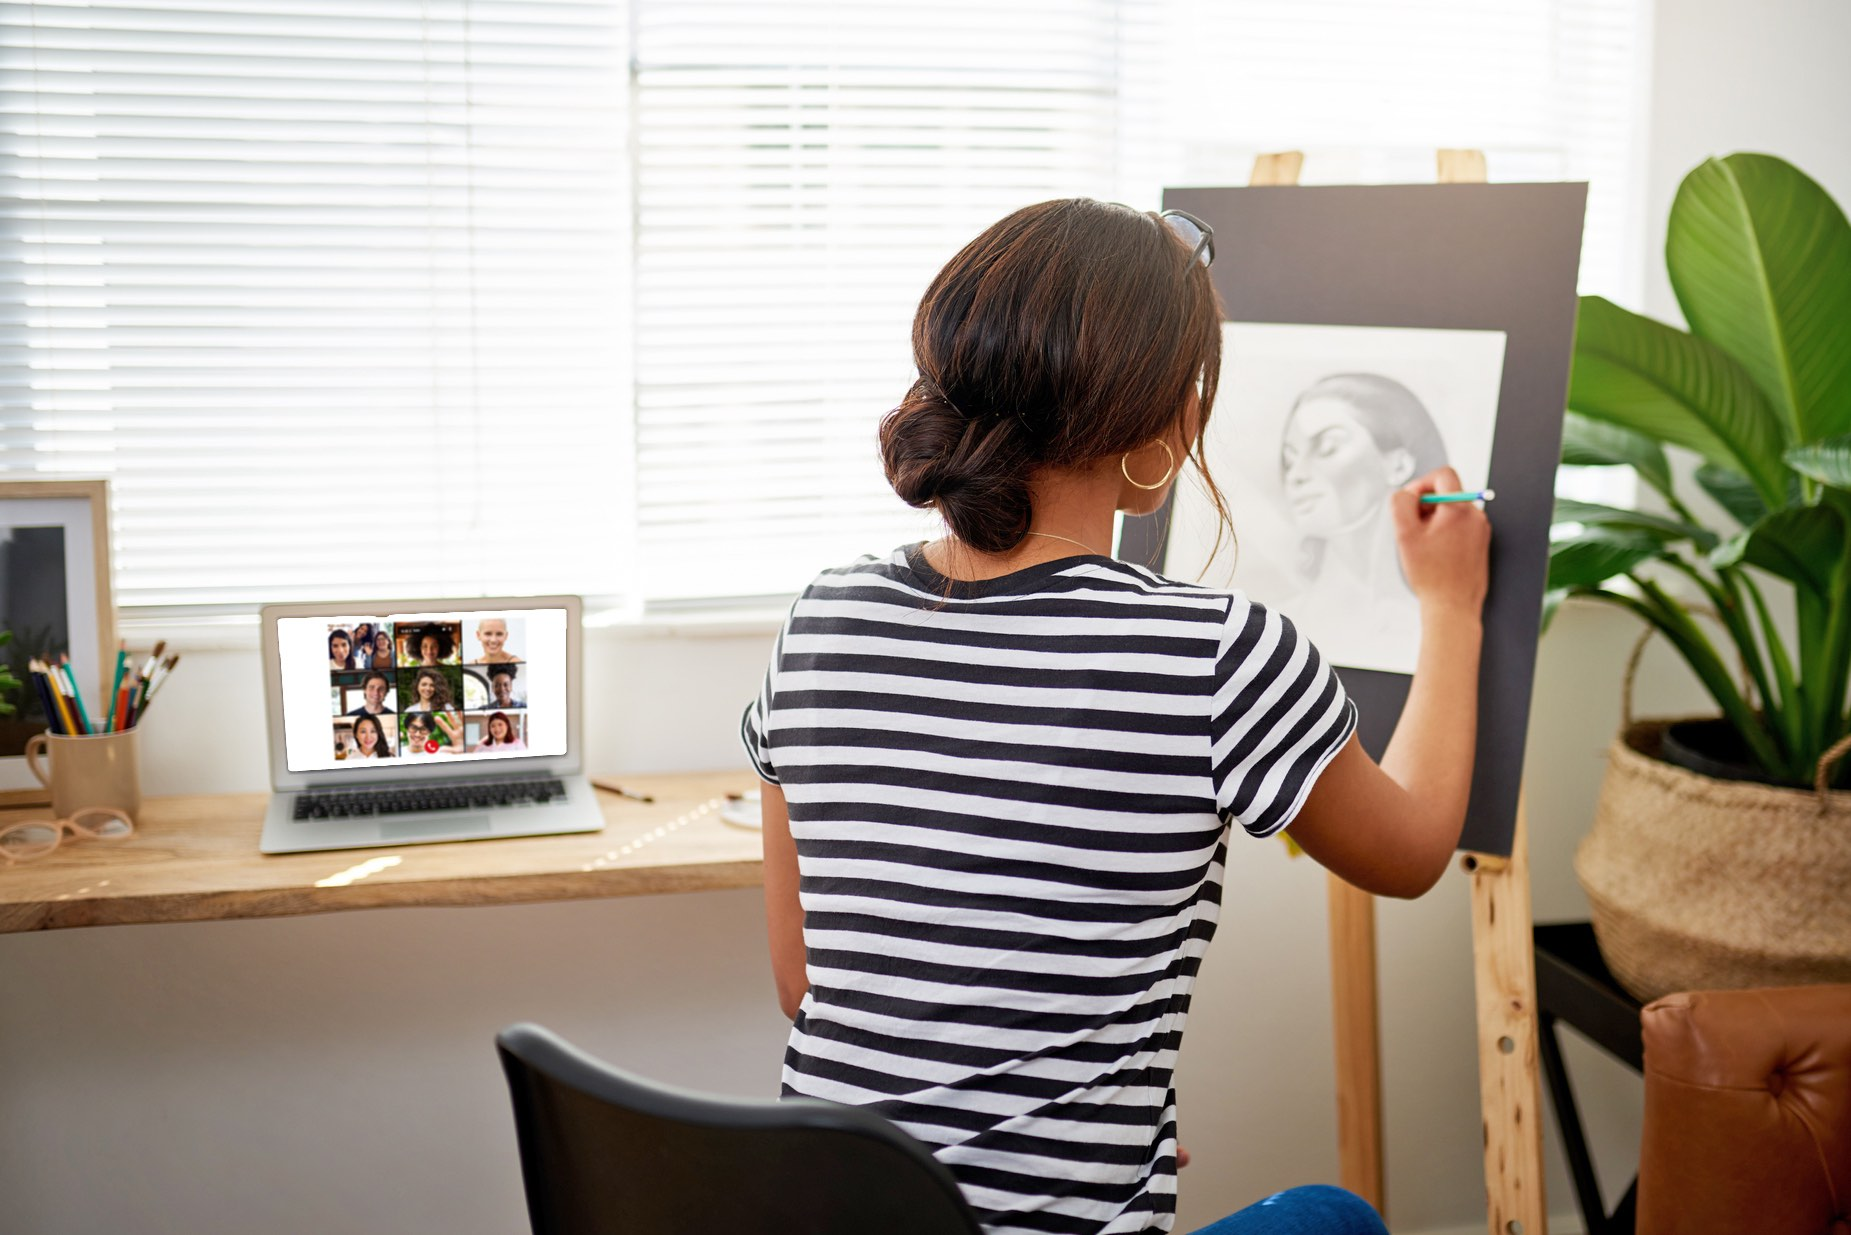 Create Art Studio Adult Online Art Class drawing painting crafting sculpture handbuilding clay creativity classes